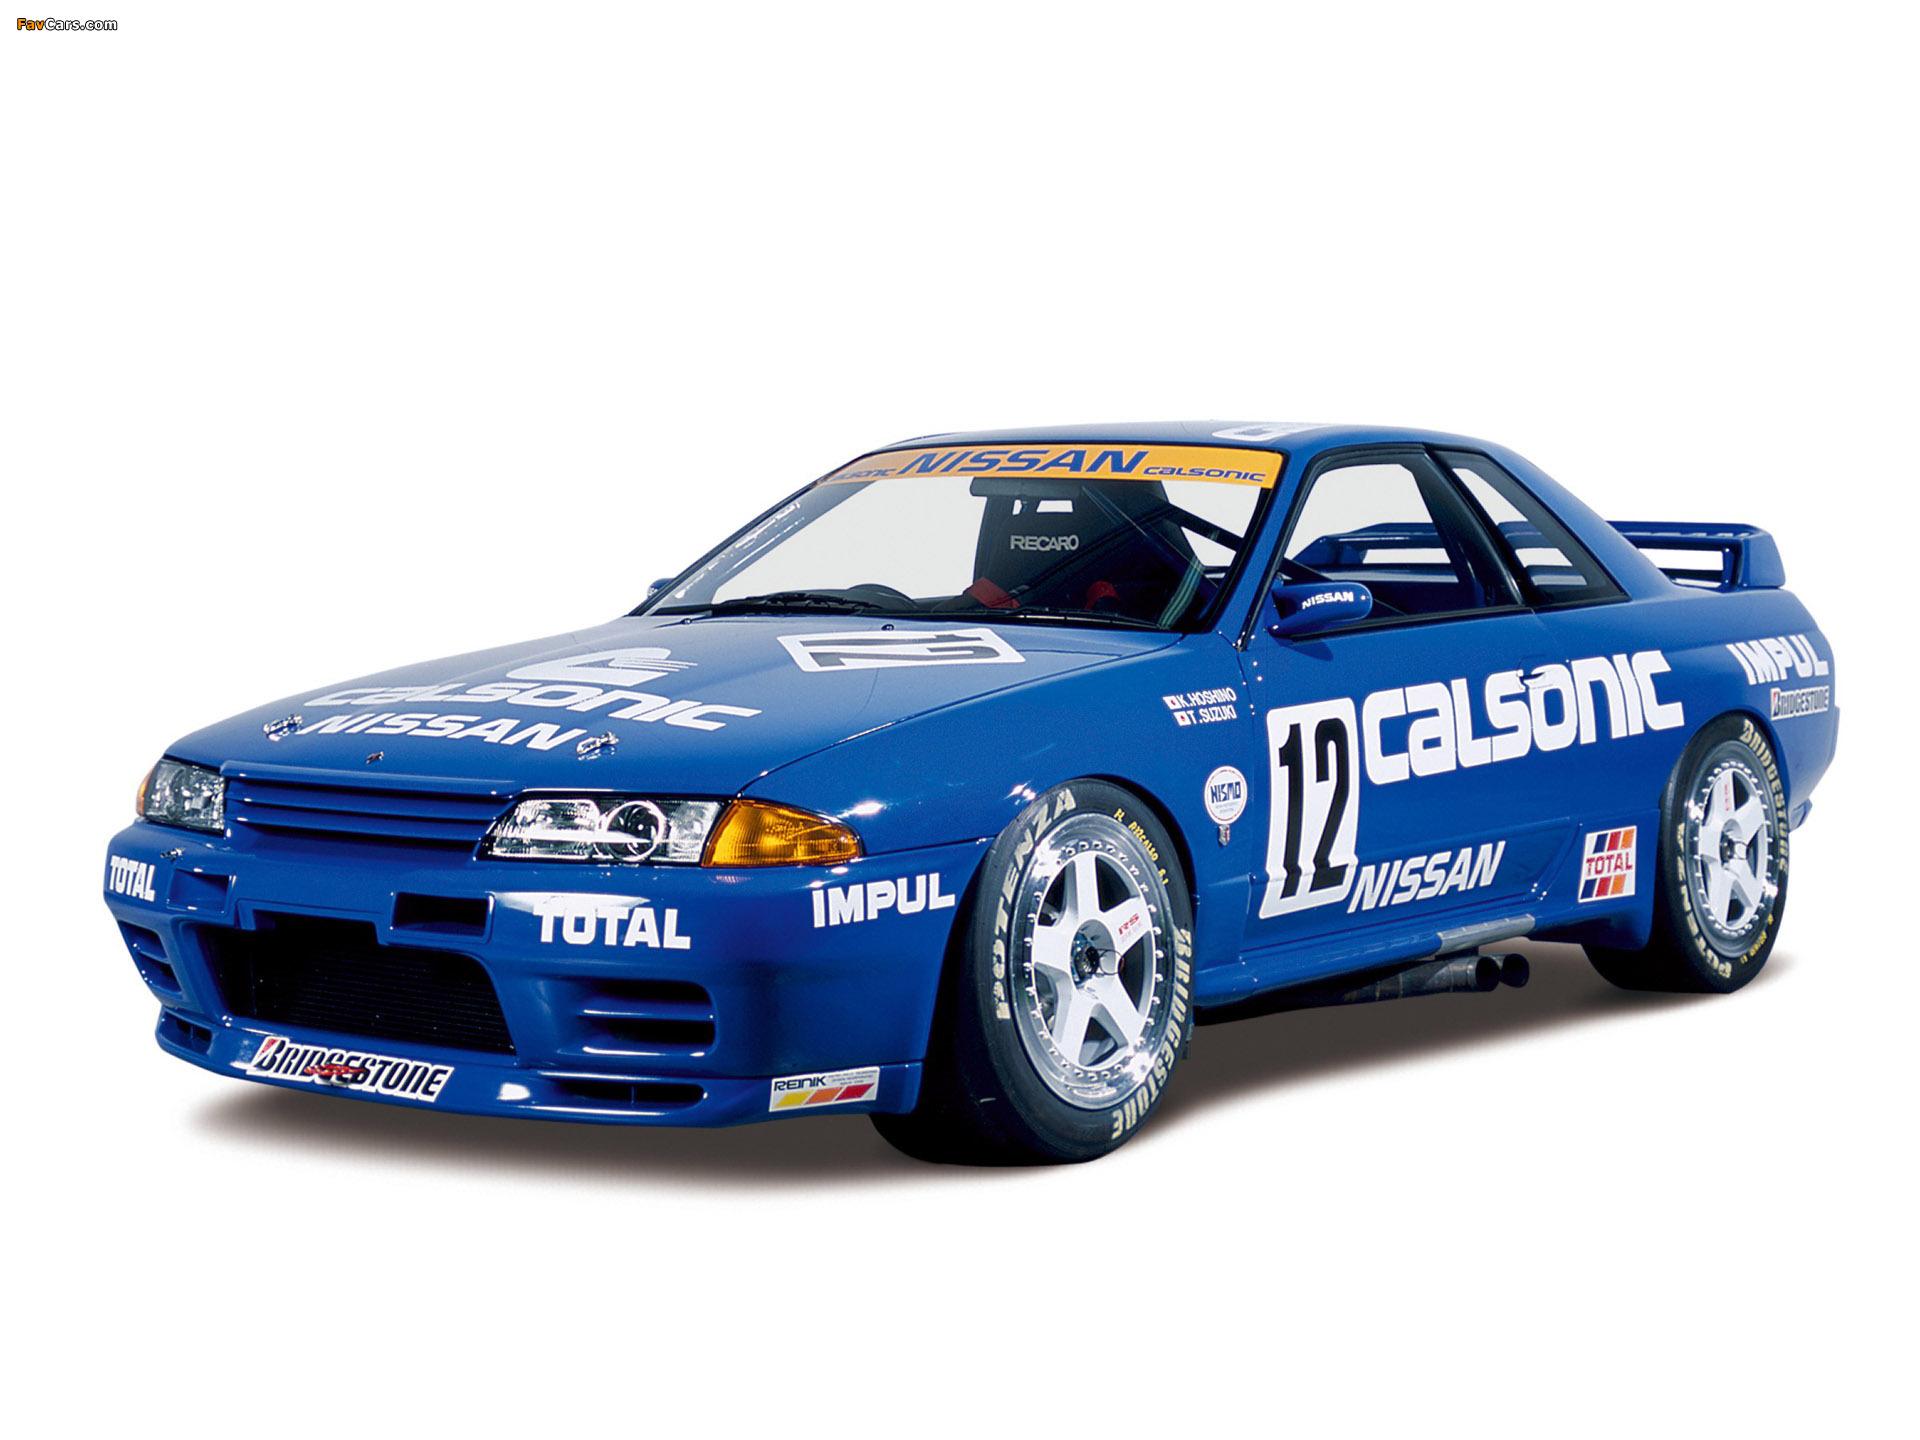 Nissan Skyline Gt R Jgtc Race Car R32 1989 93 Images